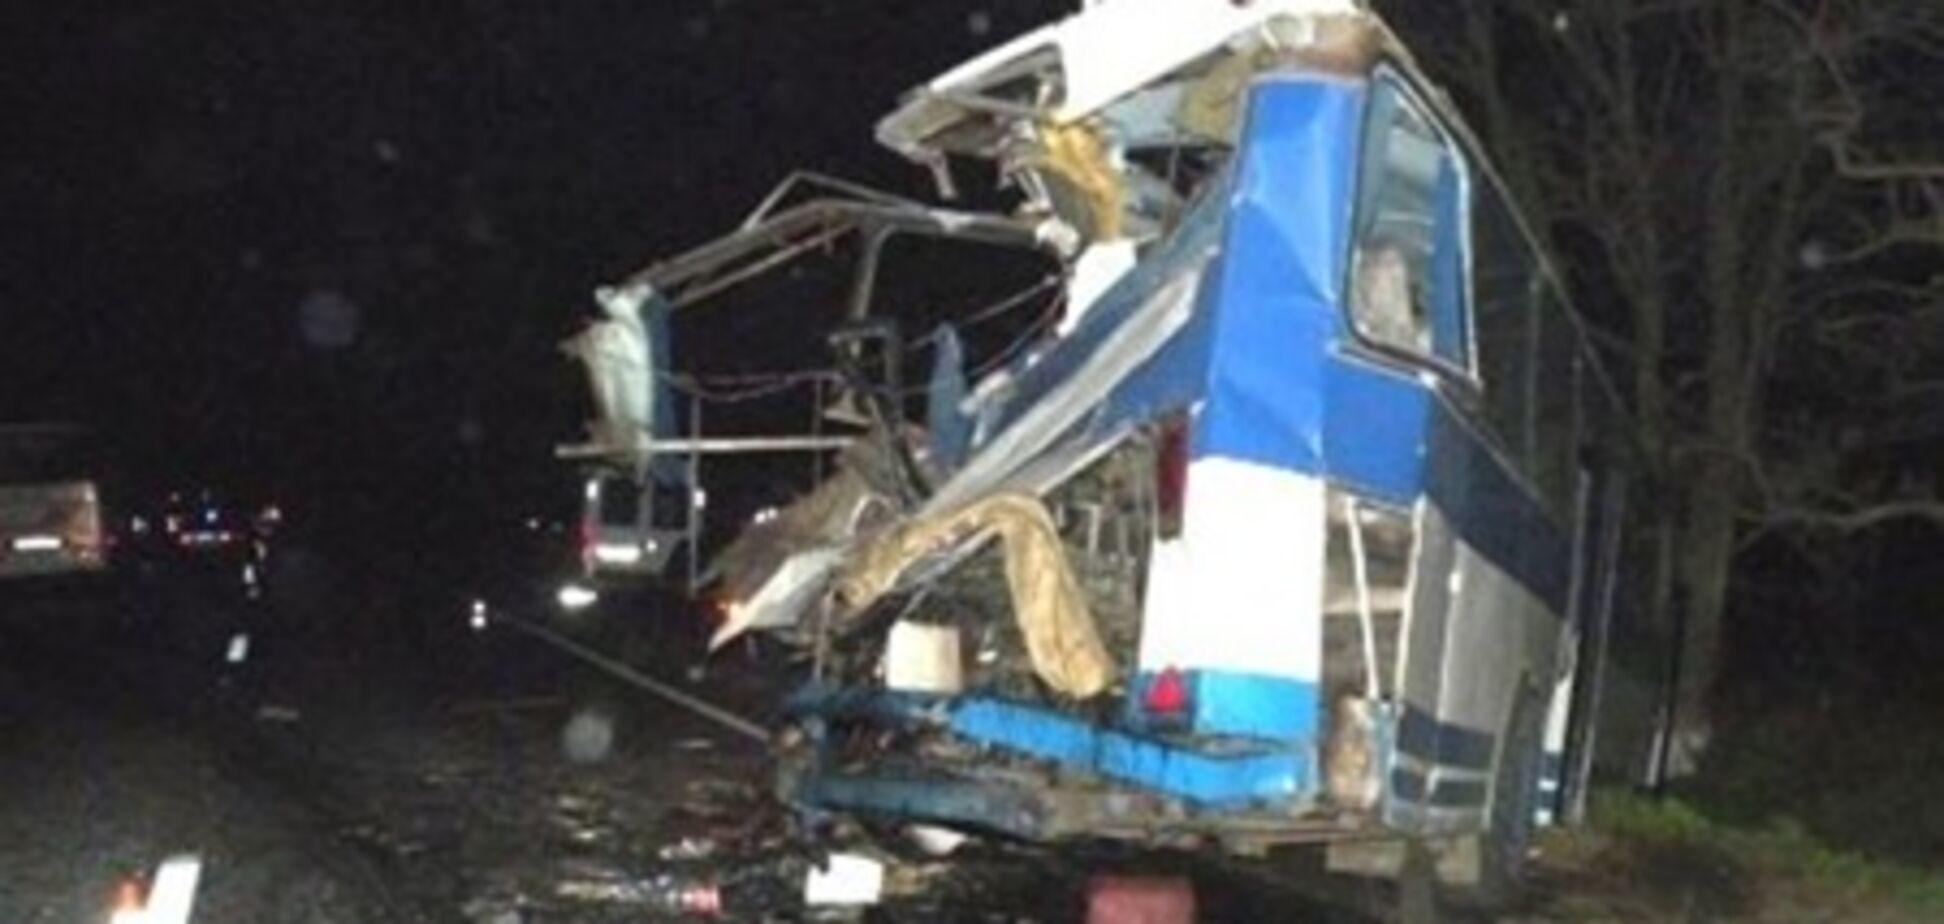 Ситуация на дорогах 21 ноября: 97 ДТП, 11 погибших